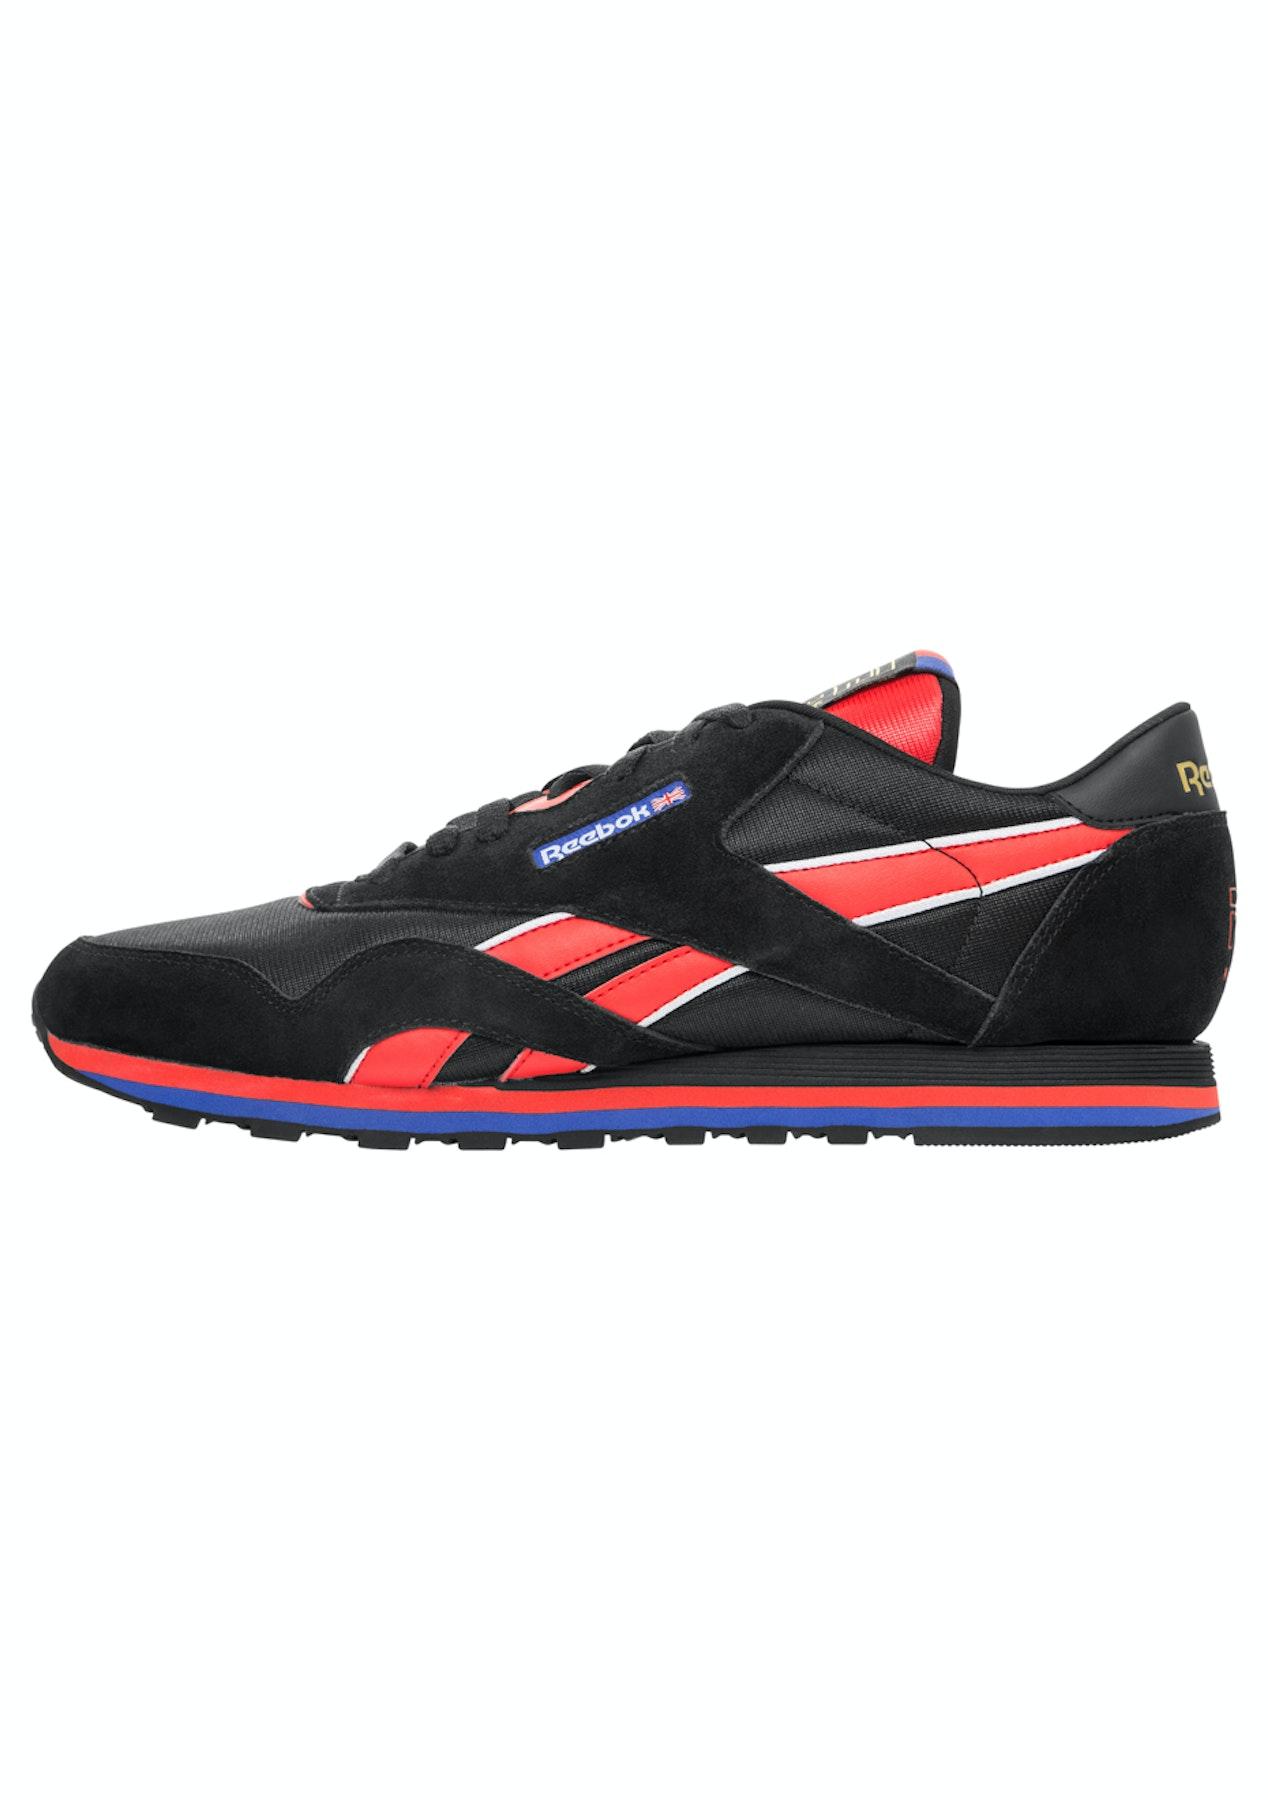 ba98216a63d999 Reebok x PE Nation Classic Nylon Trainer - Black - Reebok x PENation  Restock - Onceit